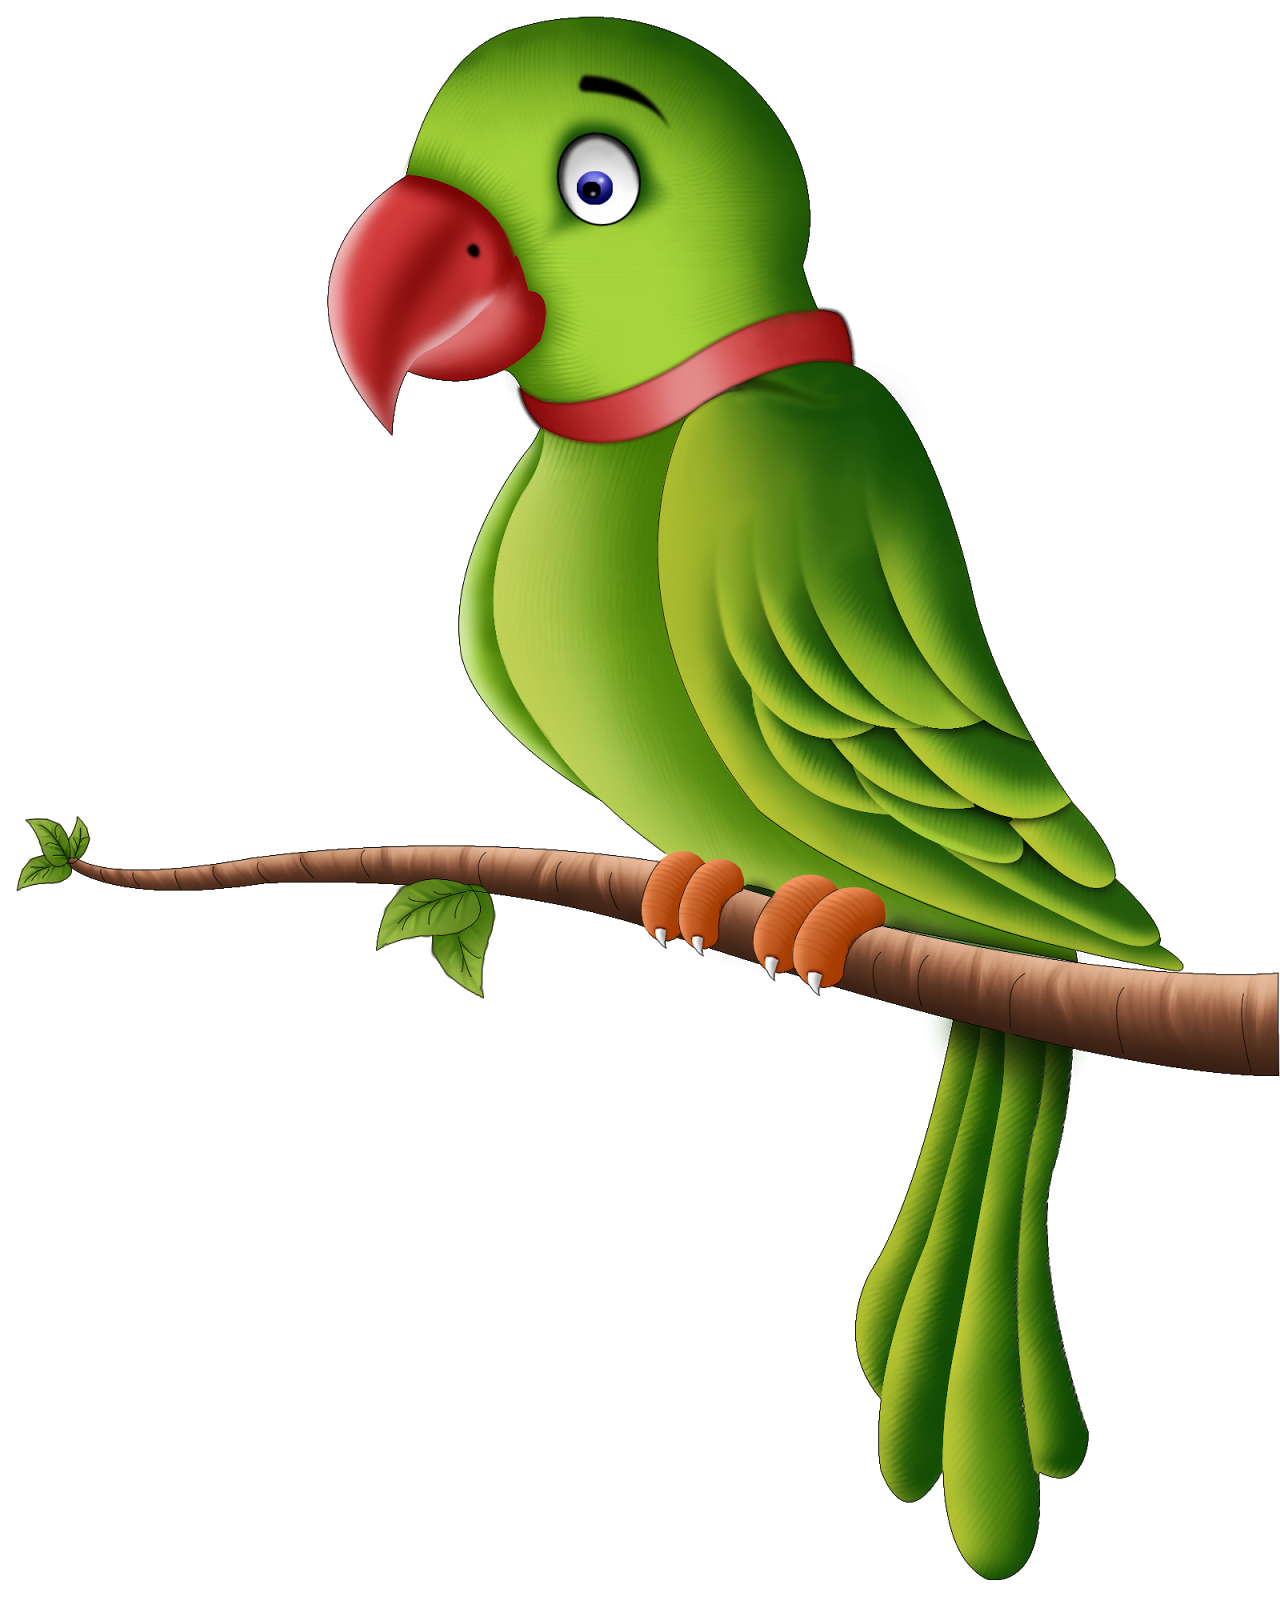 download parrot png pic hq png image freepngimg goat clip art outline goat clip art pic